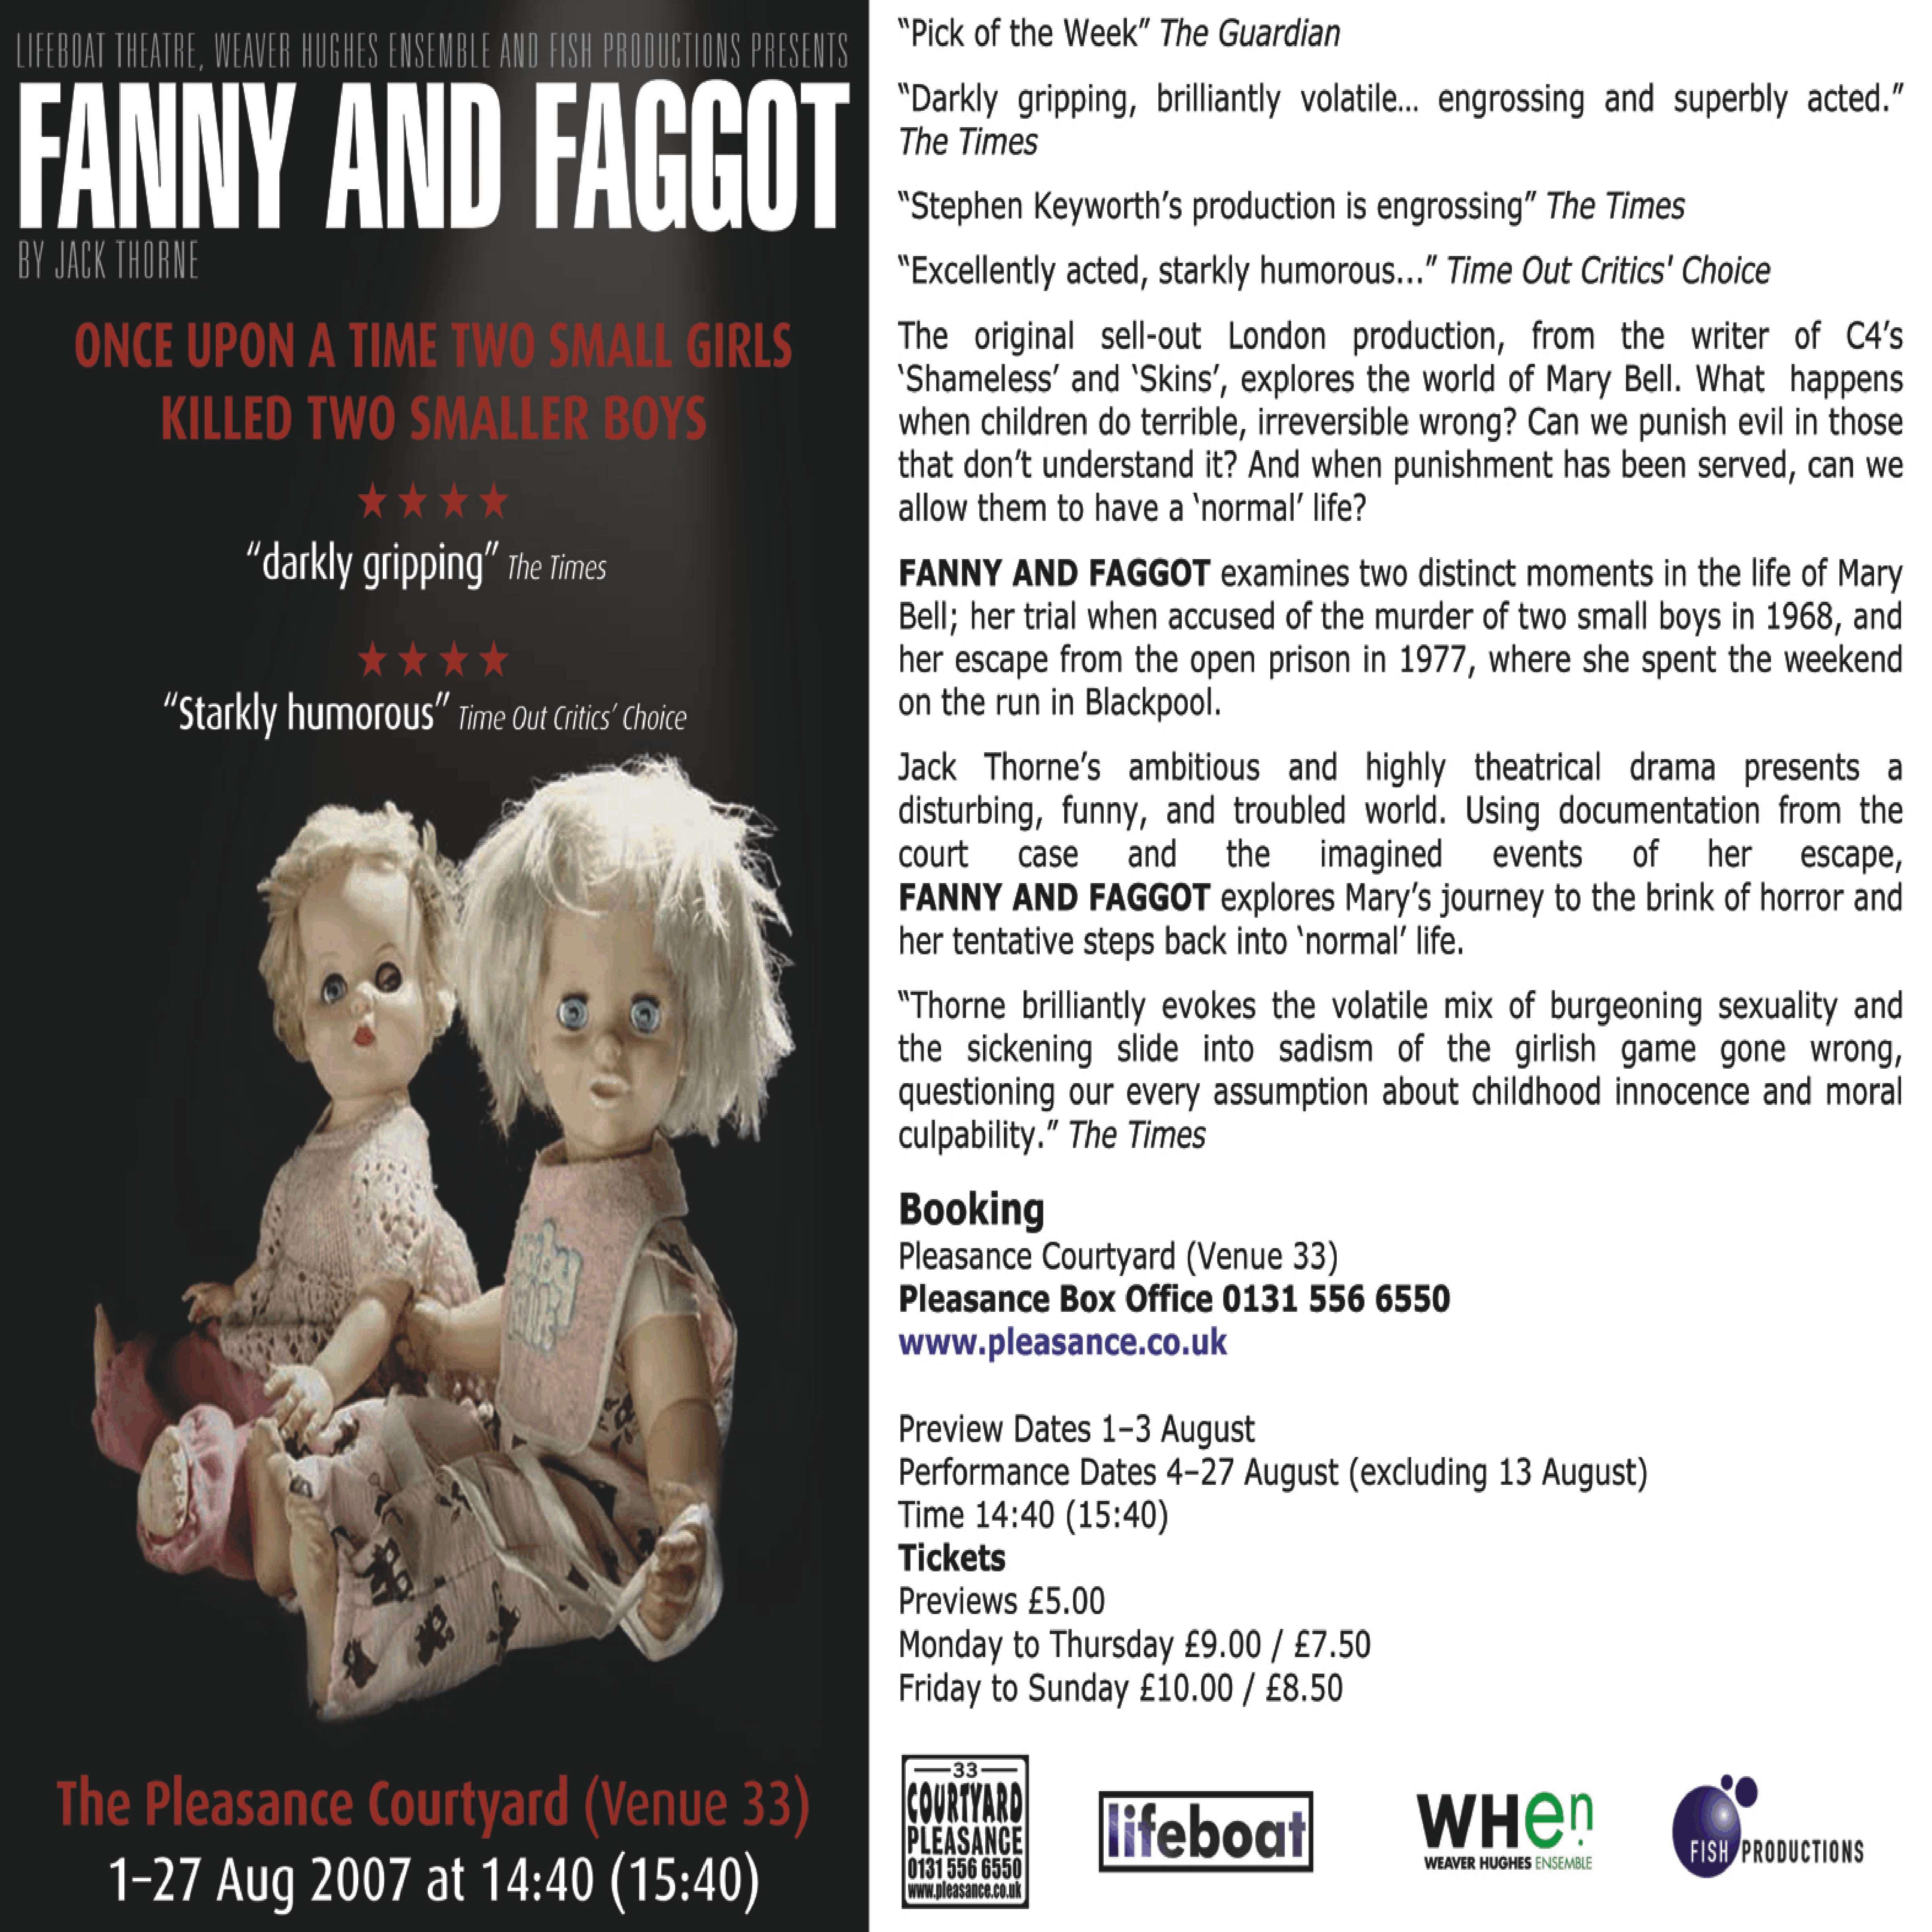 Fanny & Faggot flyer